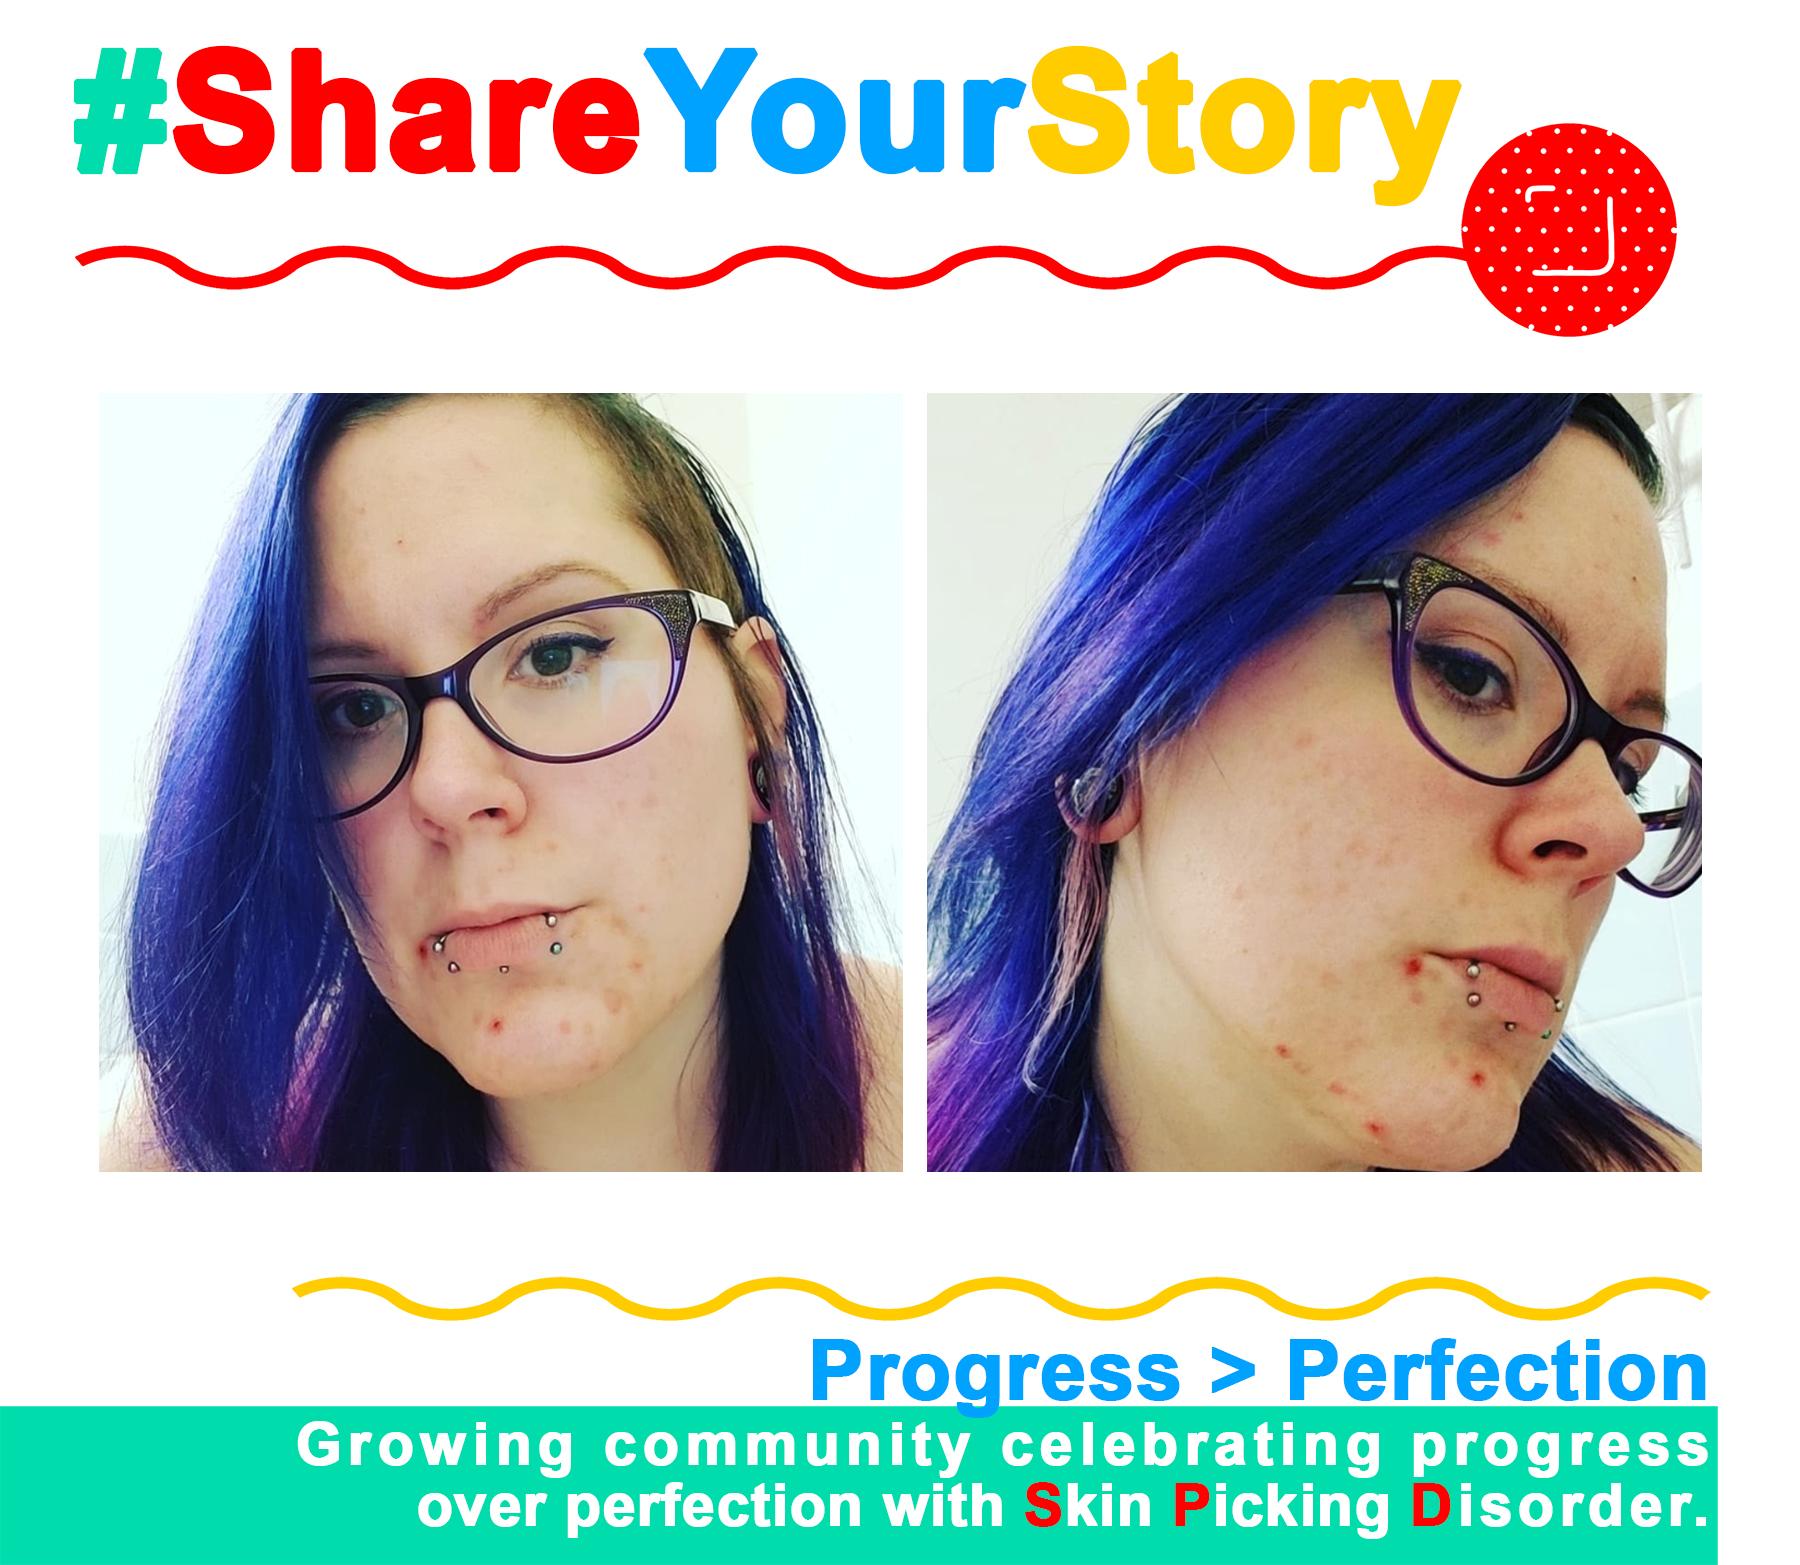 #ShareYourStory: Mia